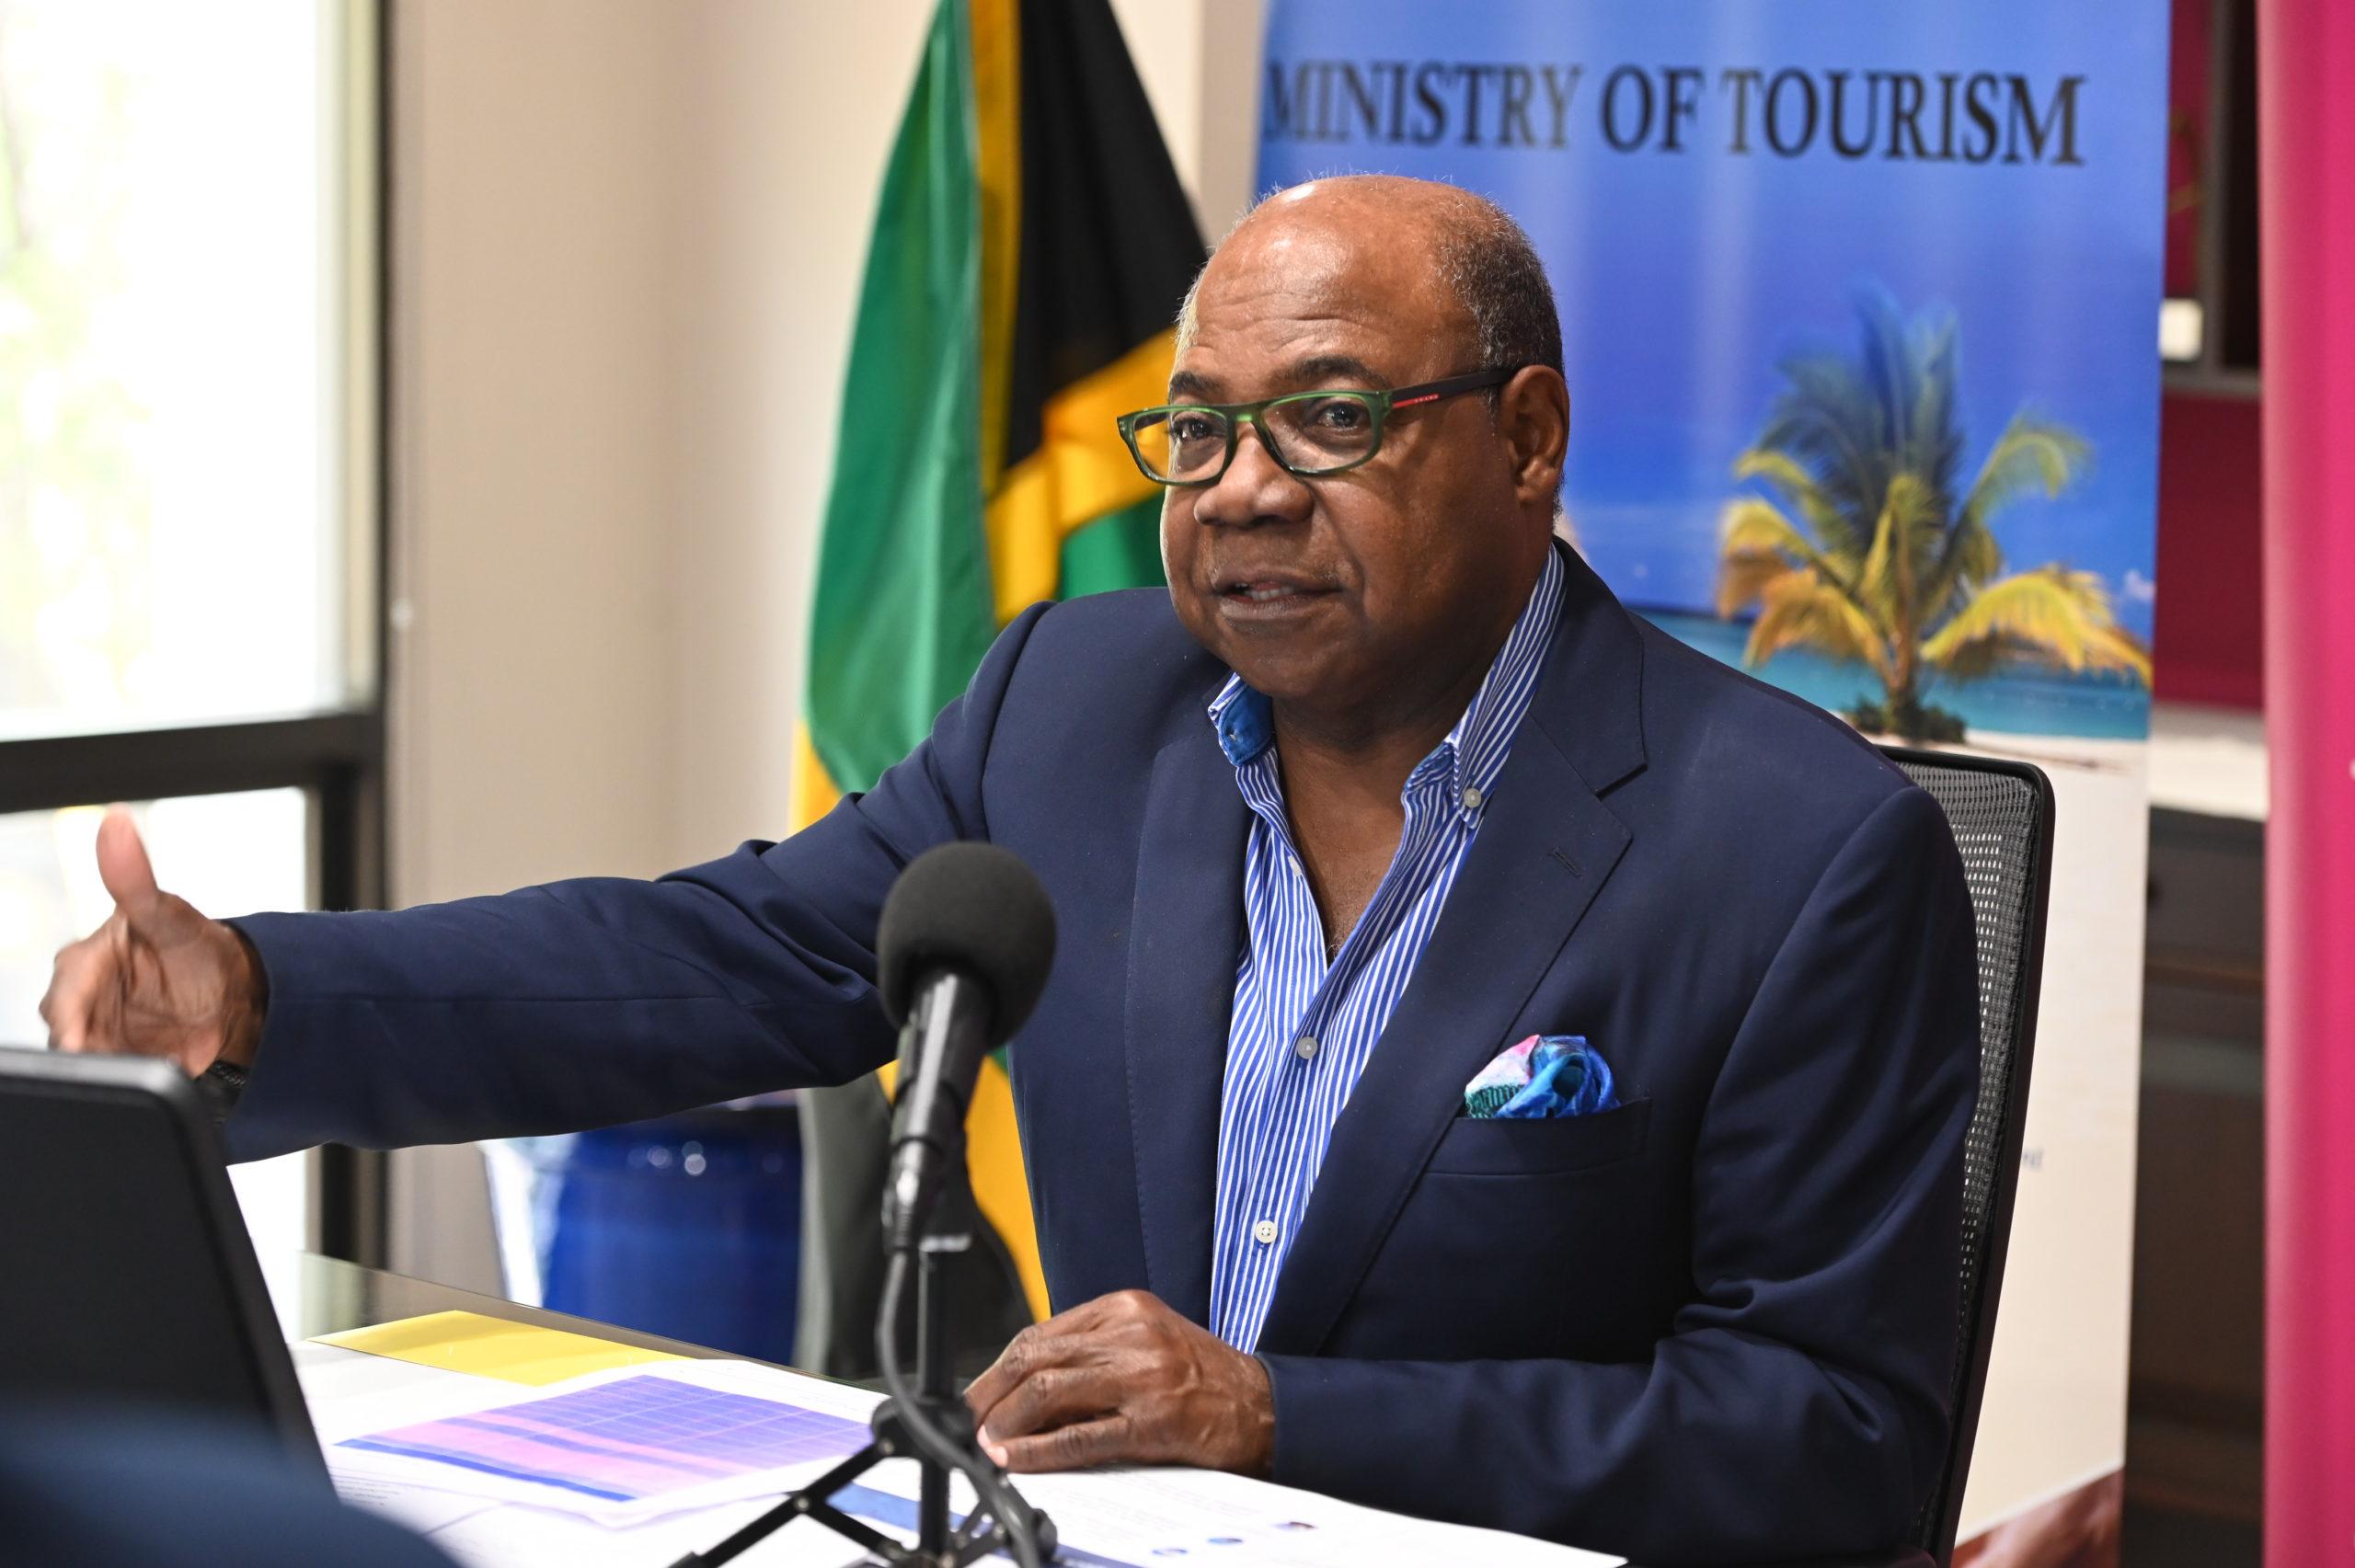 Minister Bartlett Announces 6-Month Moratorium on Tourism Licenses